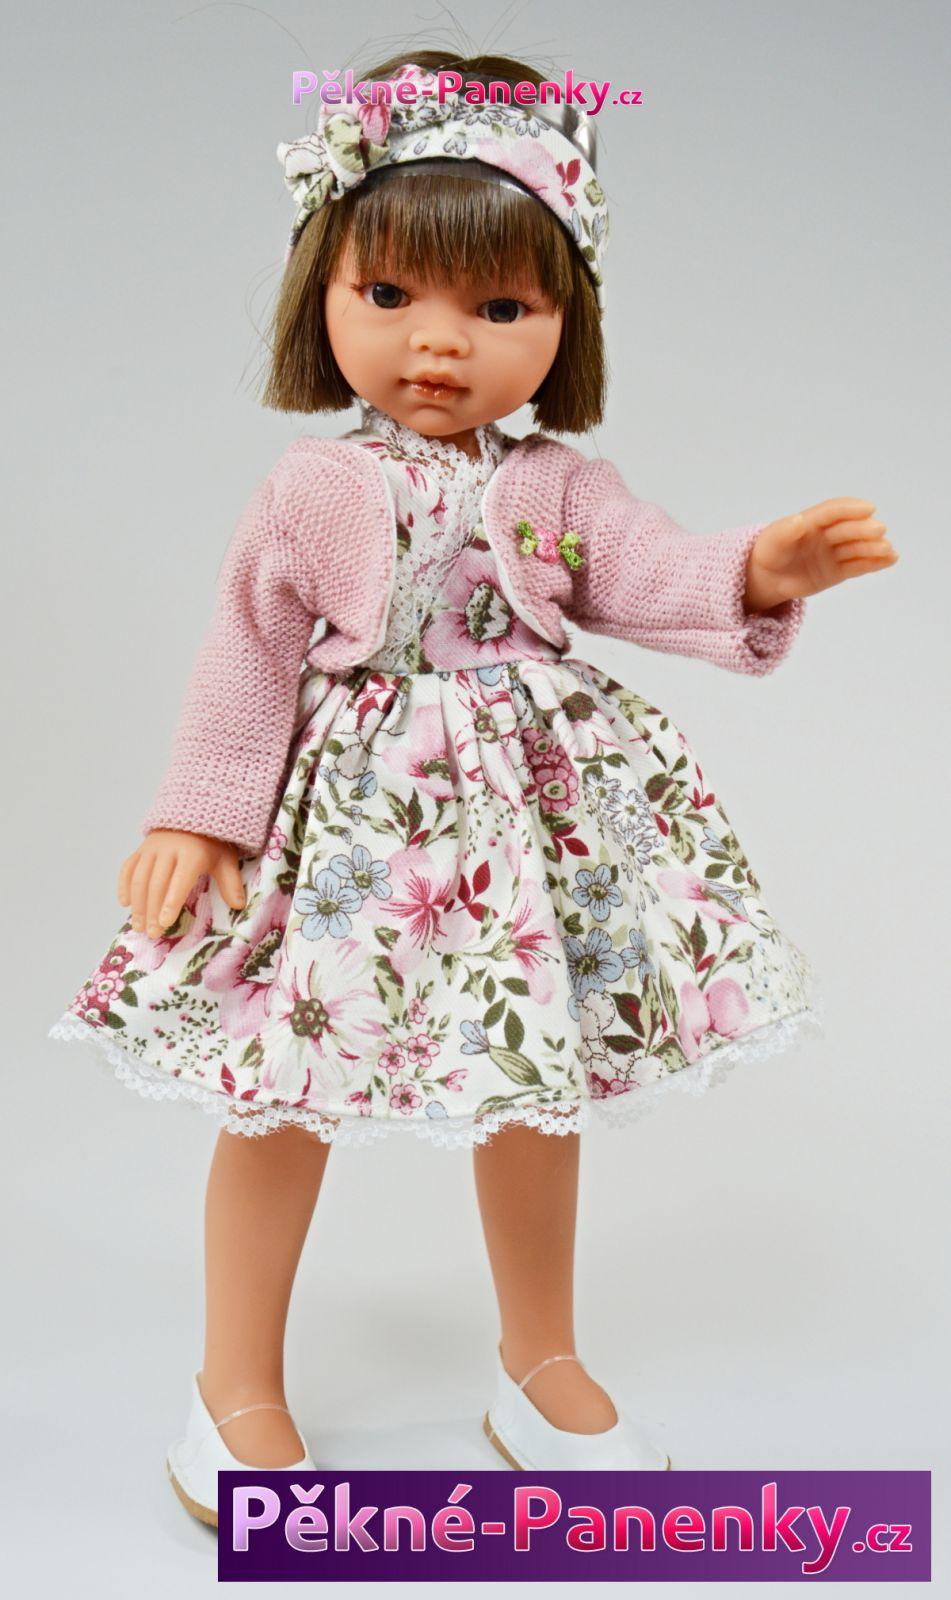 Antonio Juan realistická panenka s vlasy, realistické, španělské panenky jako živé miminko